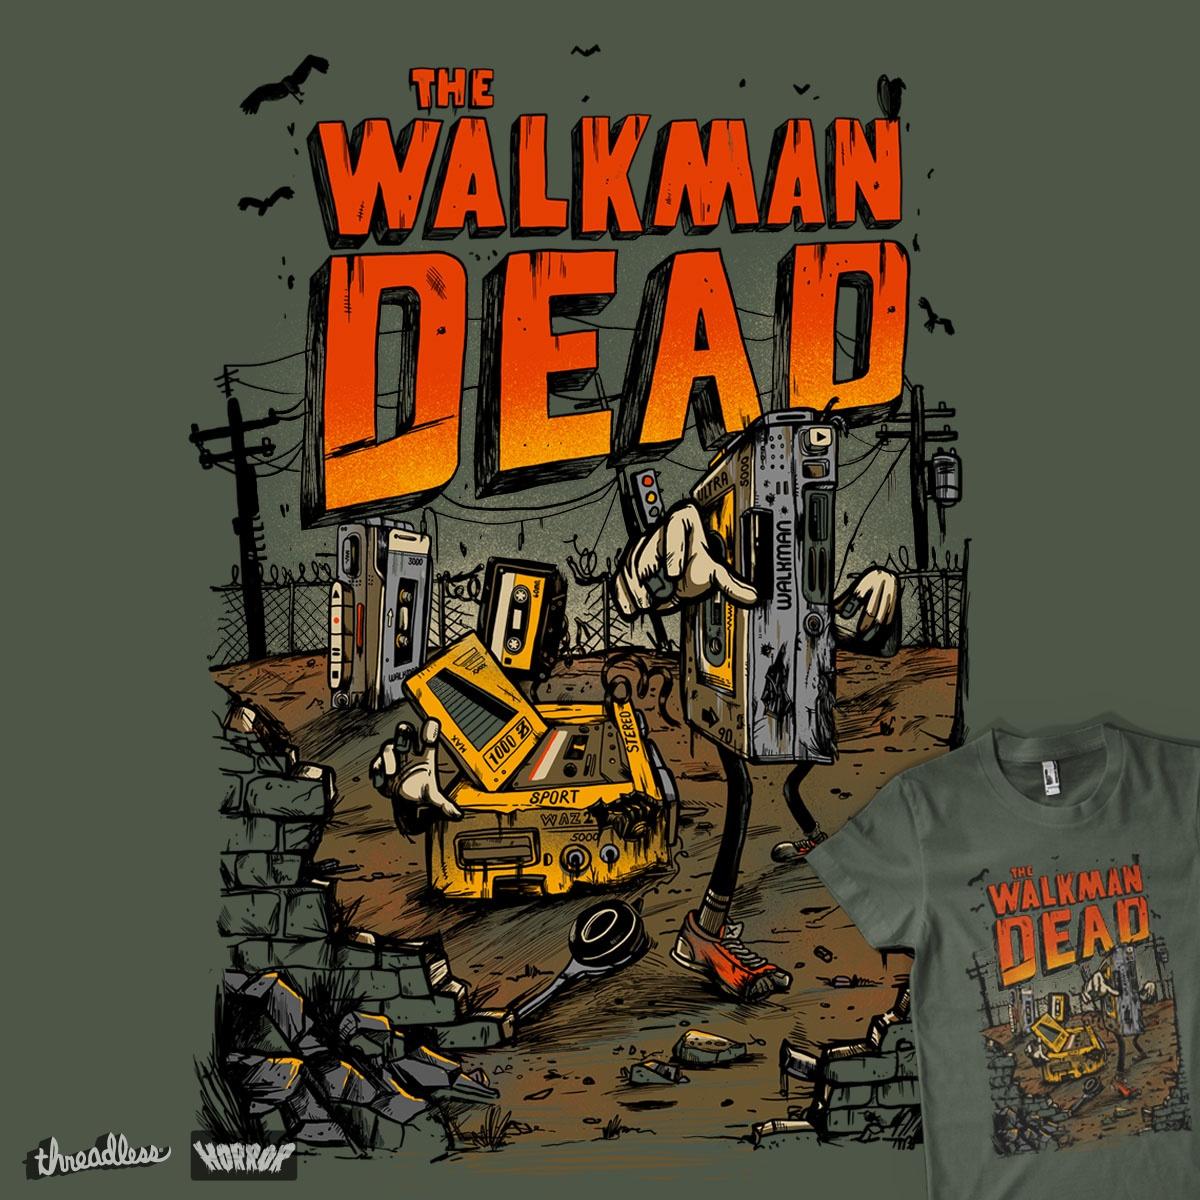 The walkman Dead by MadKobra on Threadless